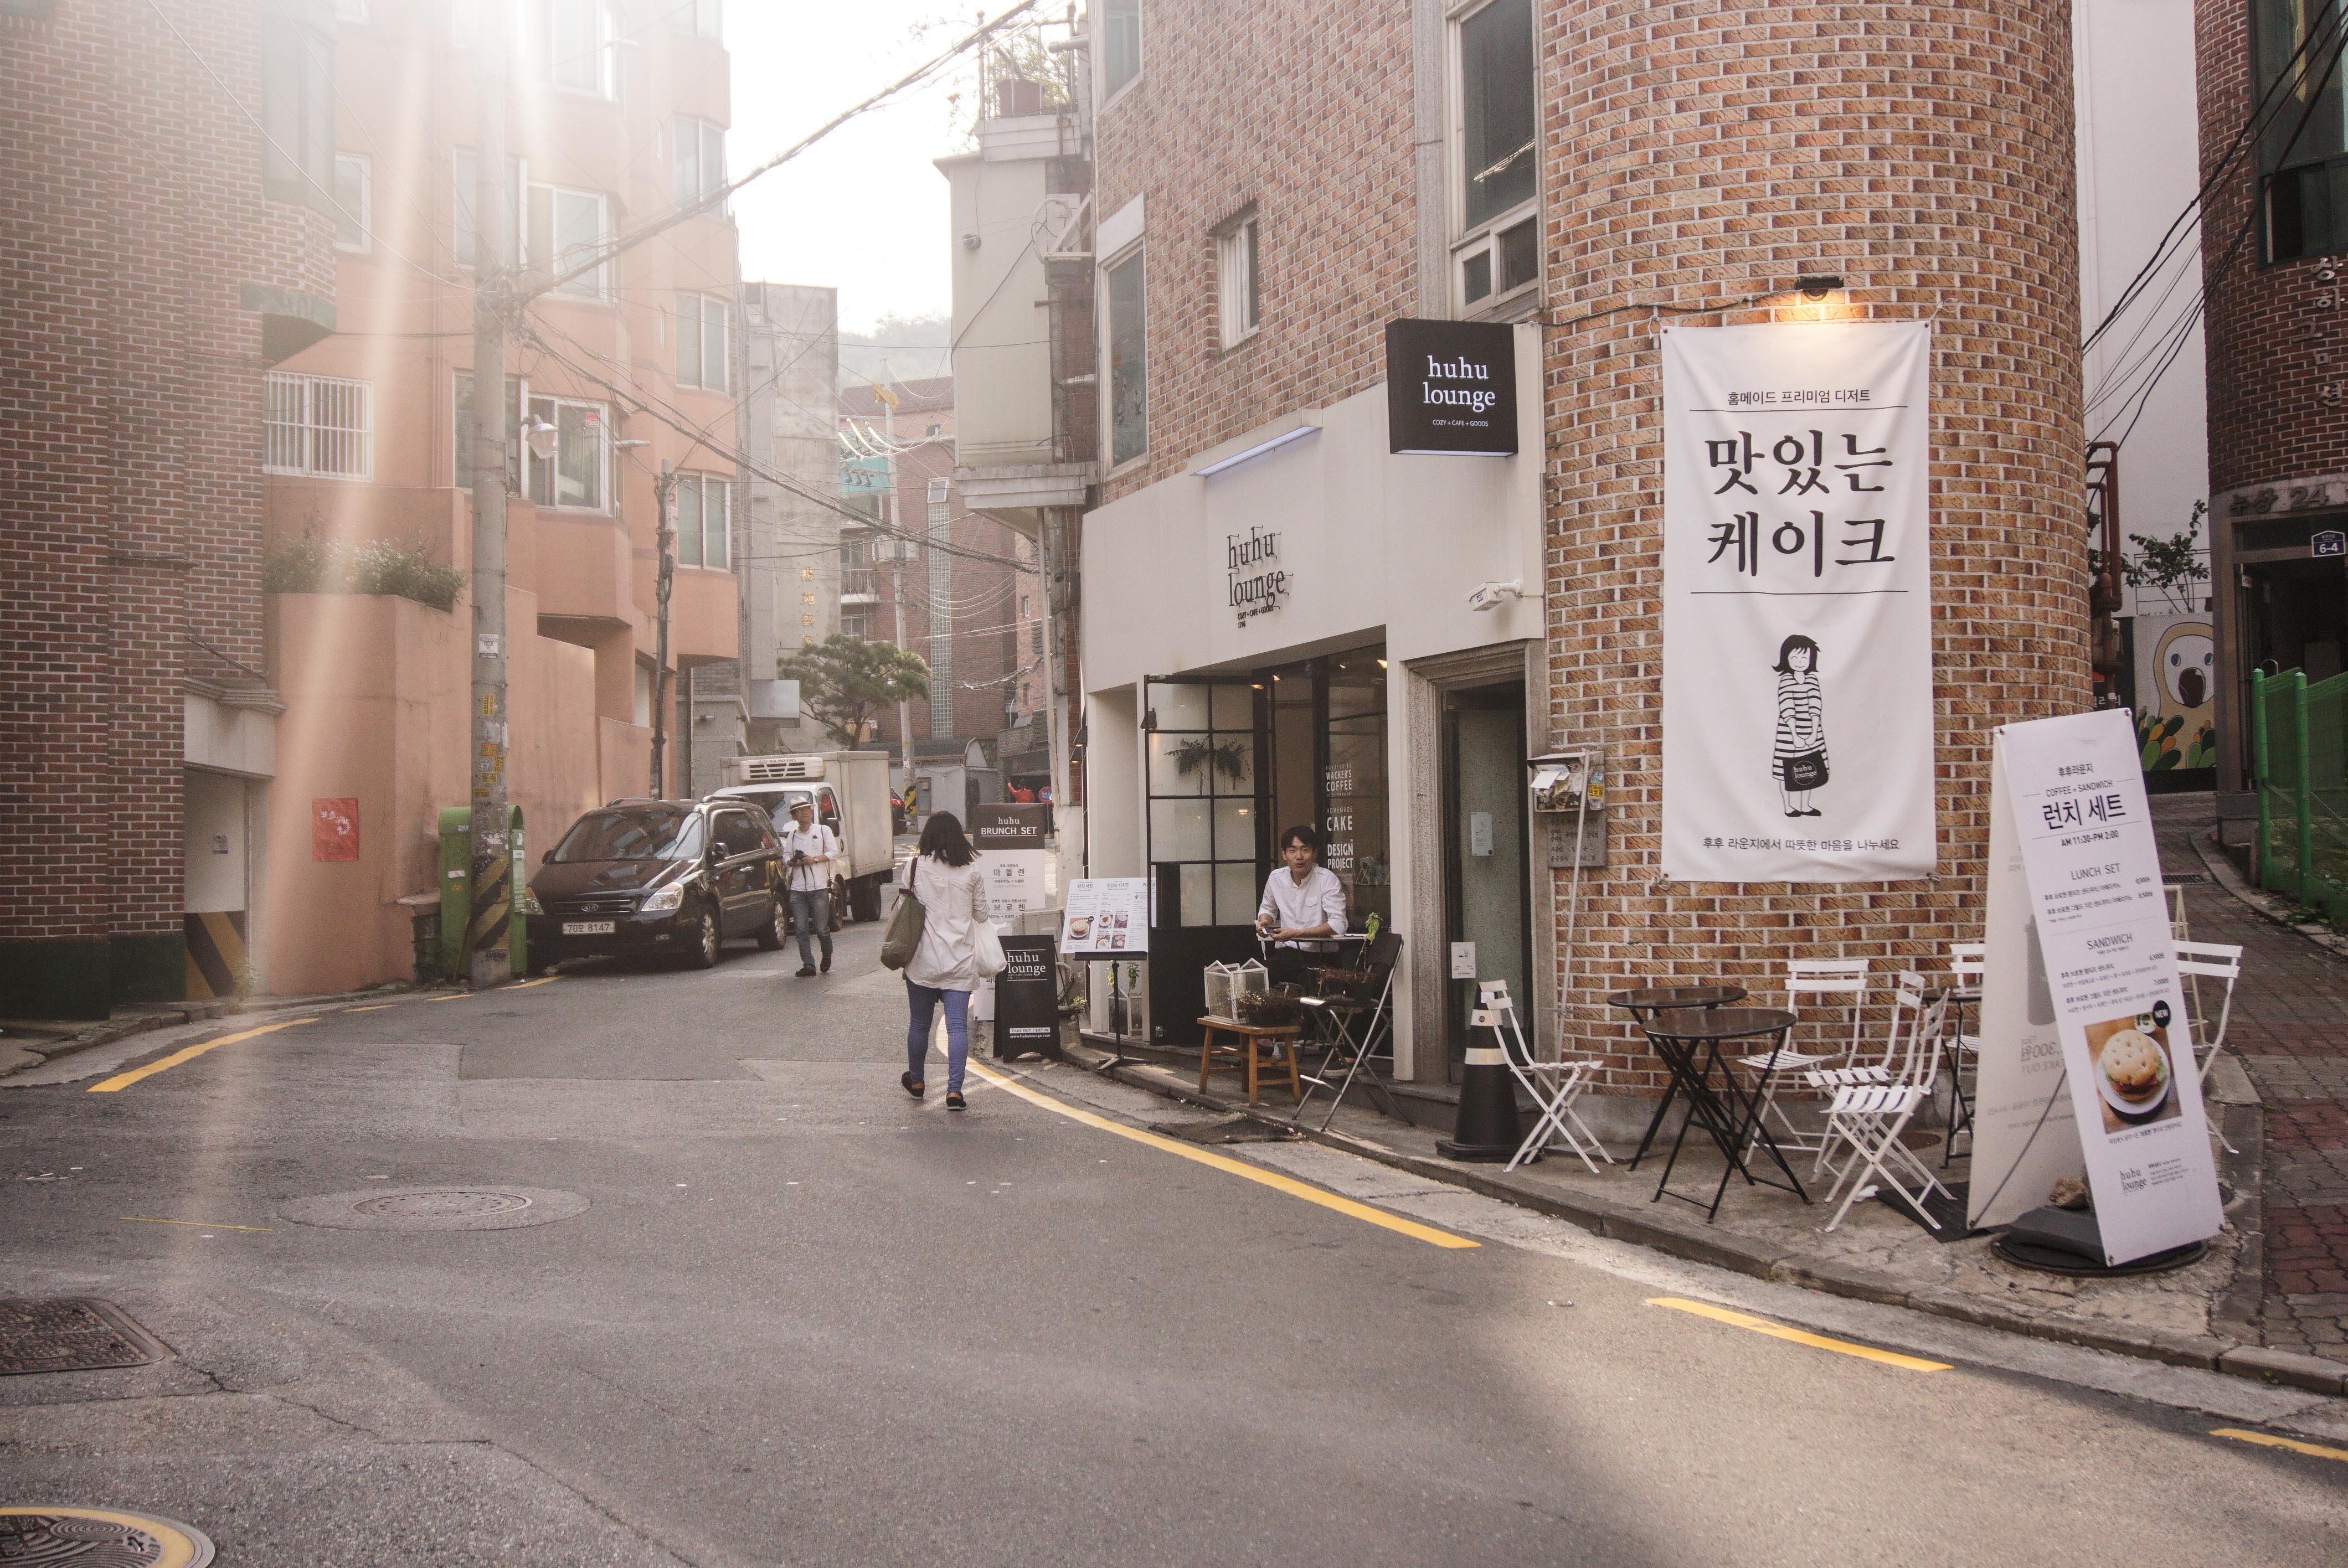 socheonwalk-13